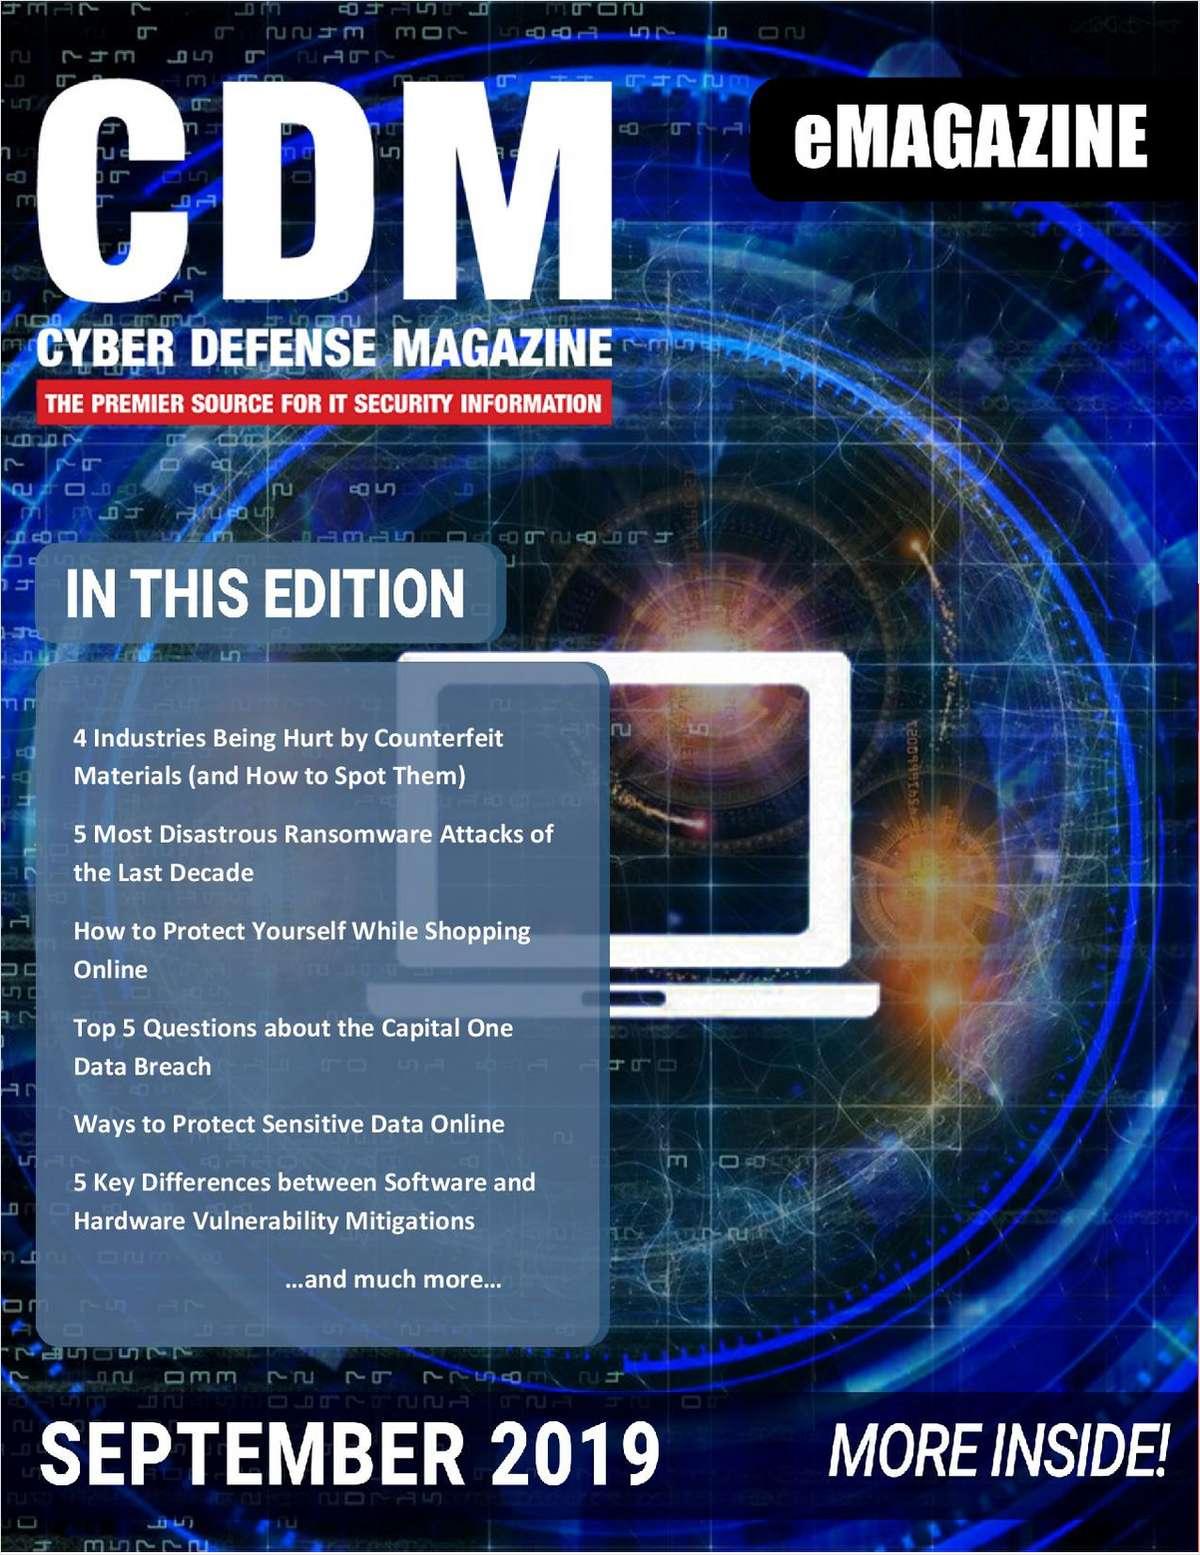 Cyber Defense eMagazine - September 2019 Edition